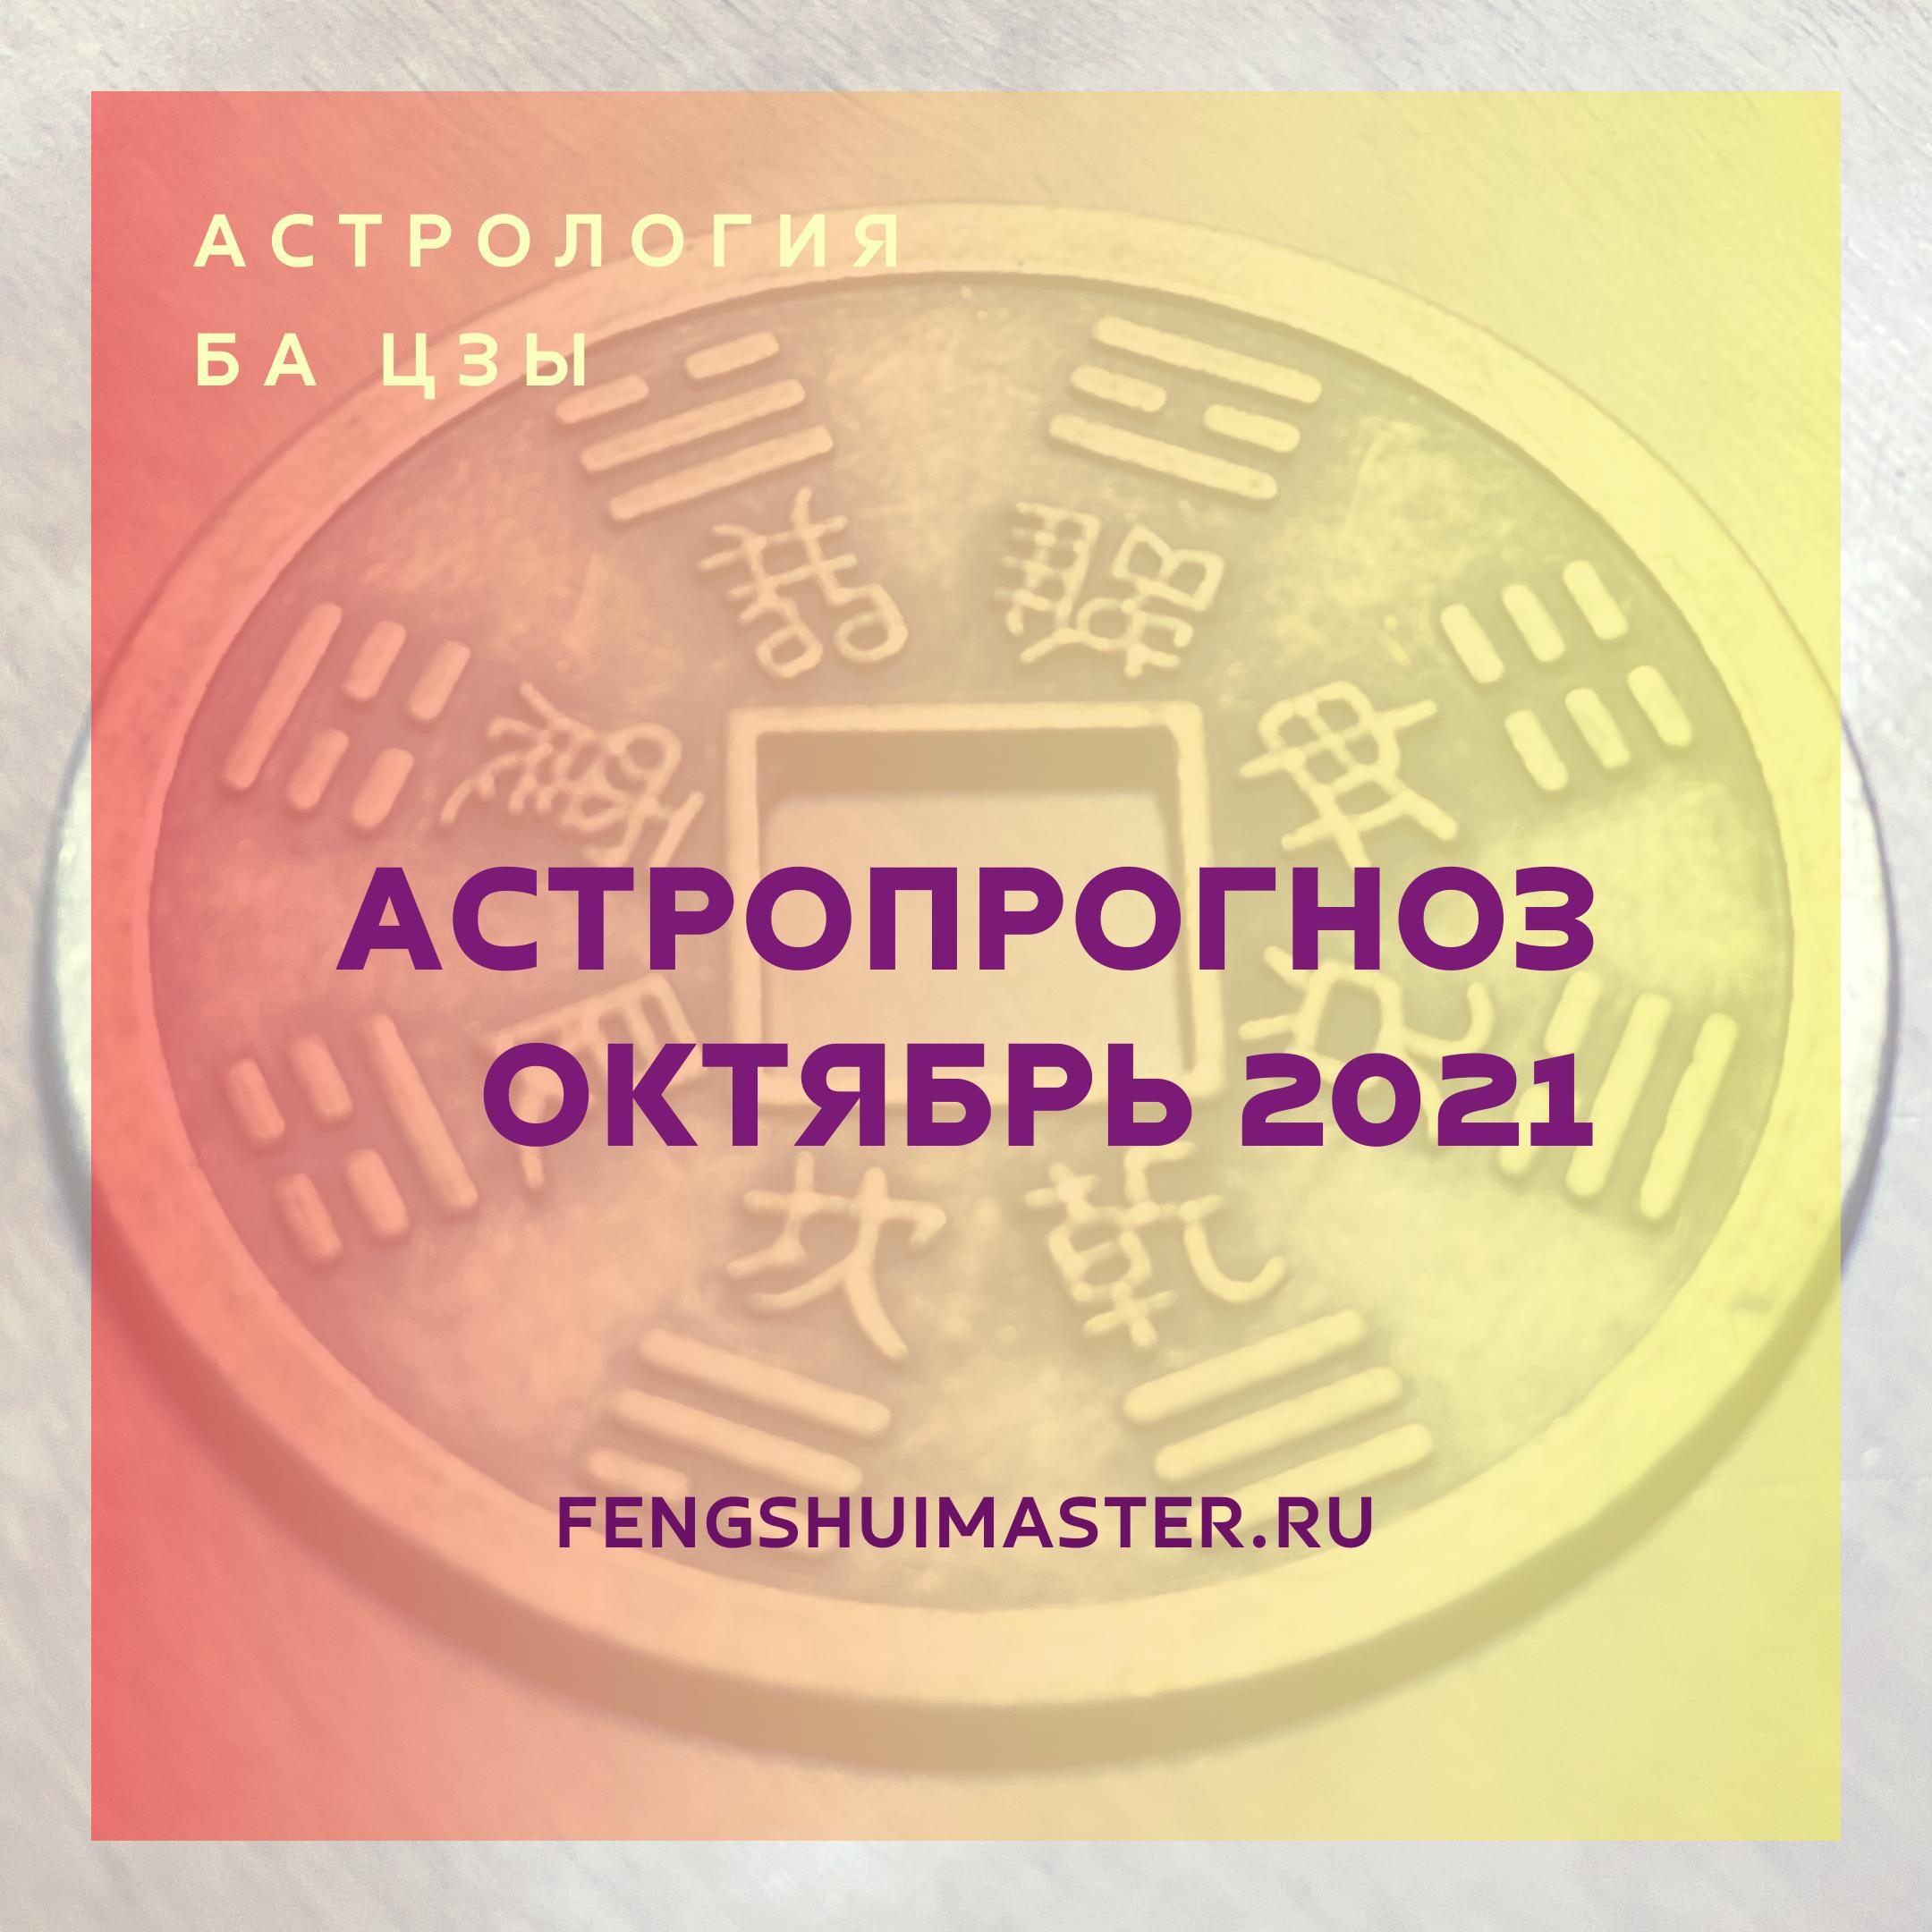 Астропрогноз октябрь 2021 • Fengshuimaster.Ru